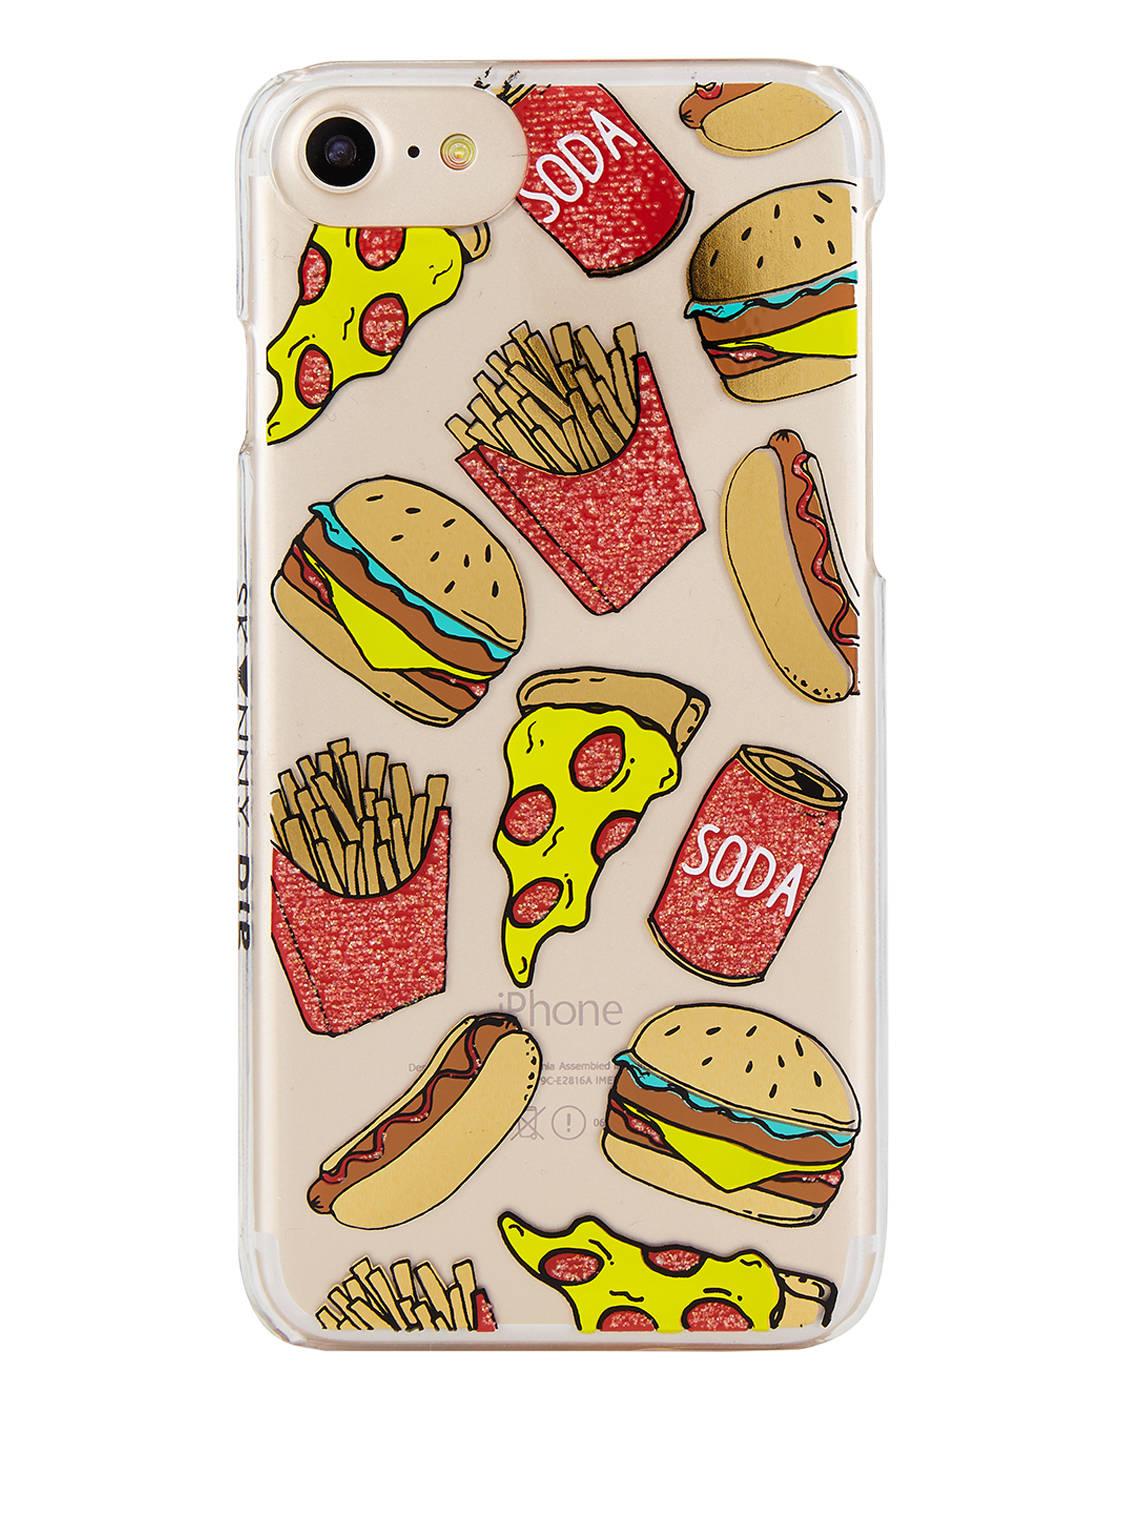 SKINNYDIP iPhone-Hülle JUNK FOOD